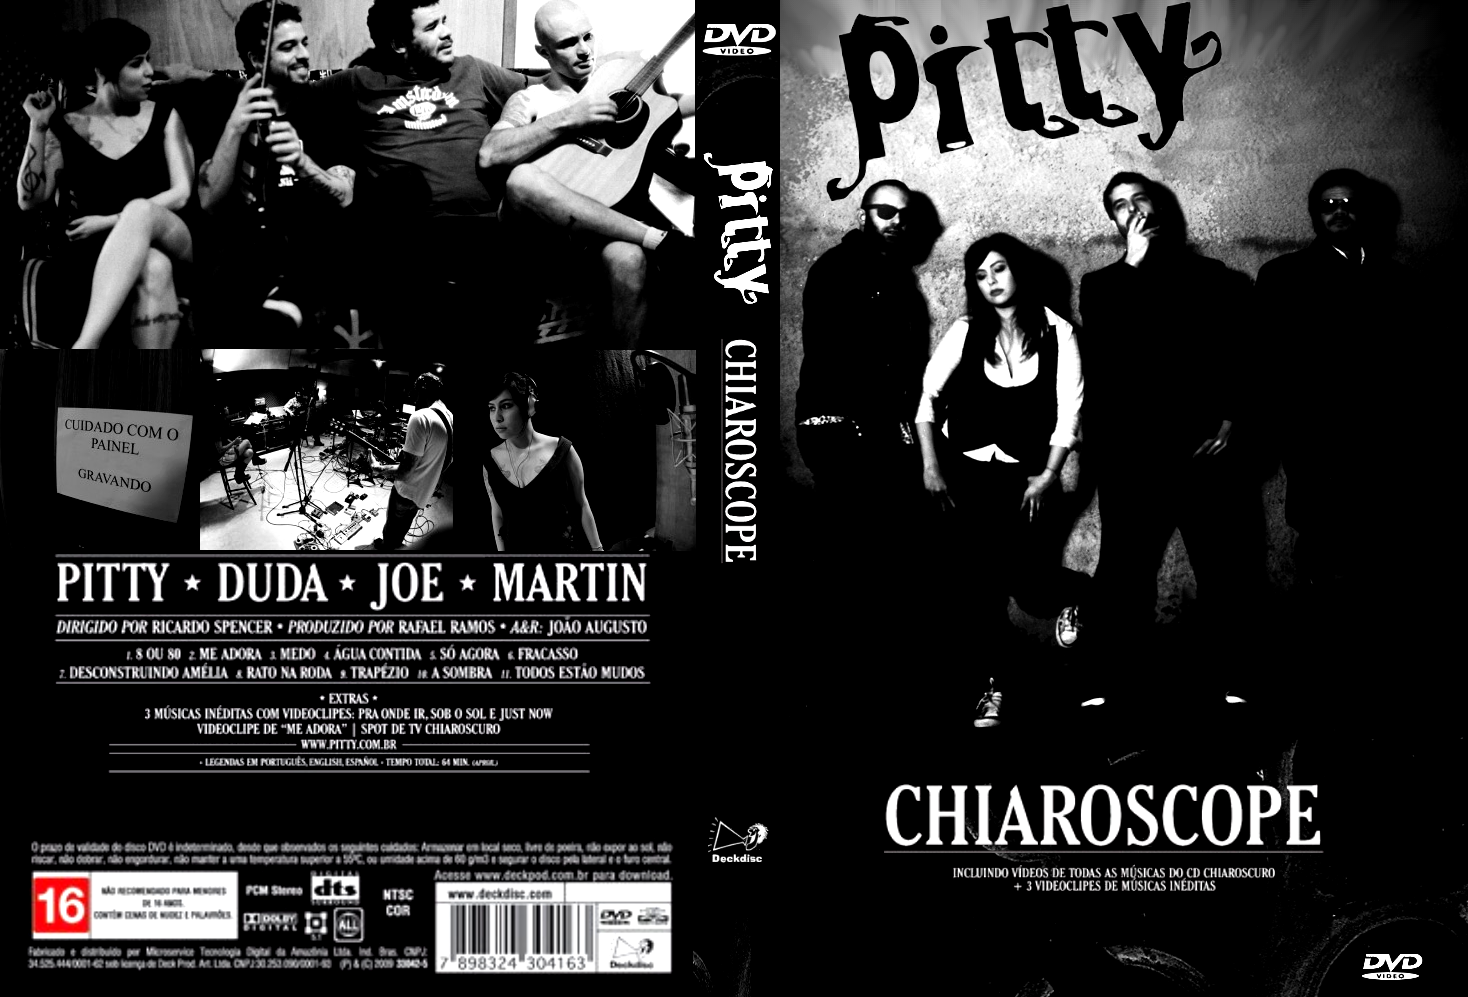 DE PITTY GRATIS CHIAROSCURO BAIXAR CD